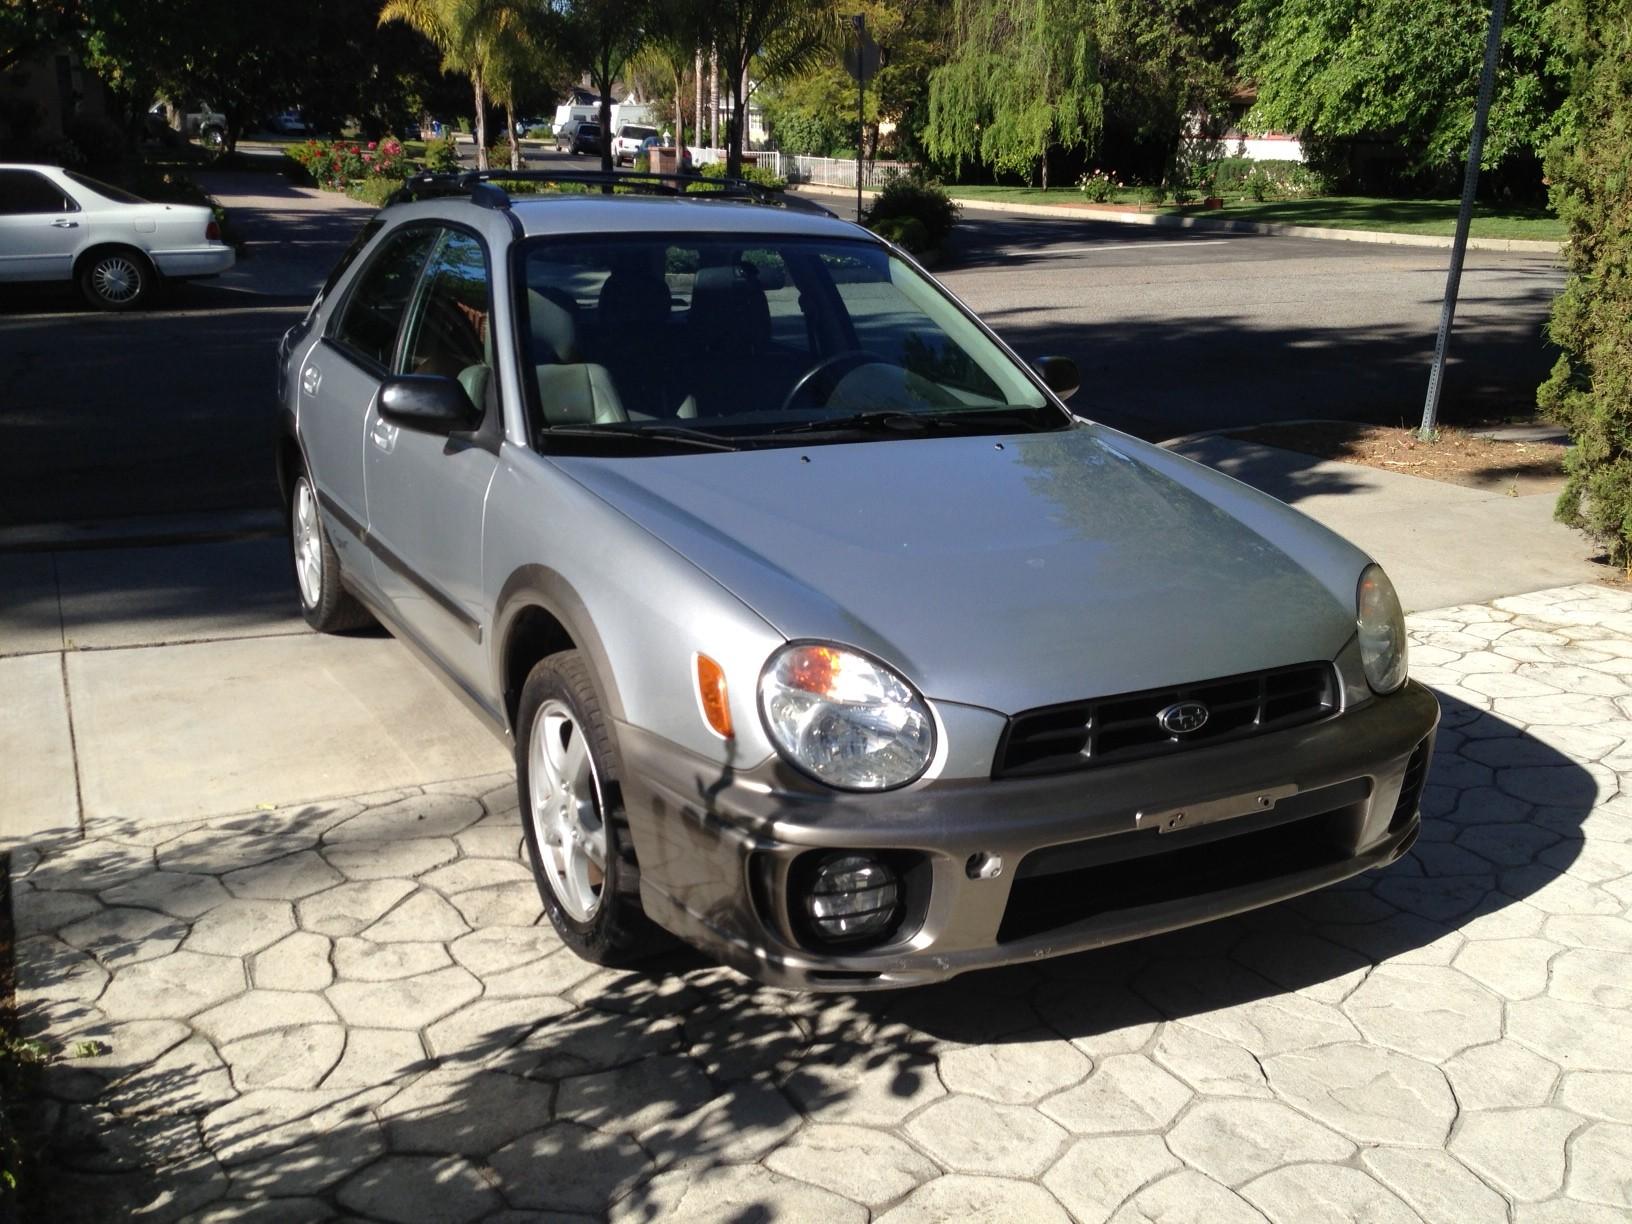 FOR SALE: 2002 Subaru Impreza -  Outback Sport AWD-subaru3.jpg